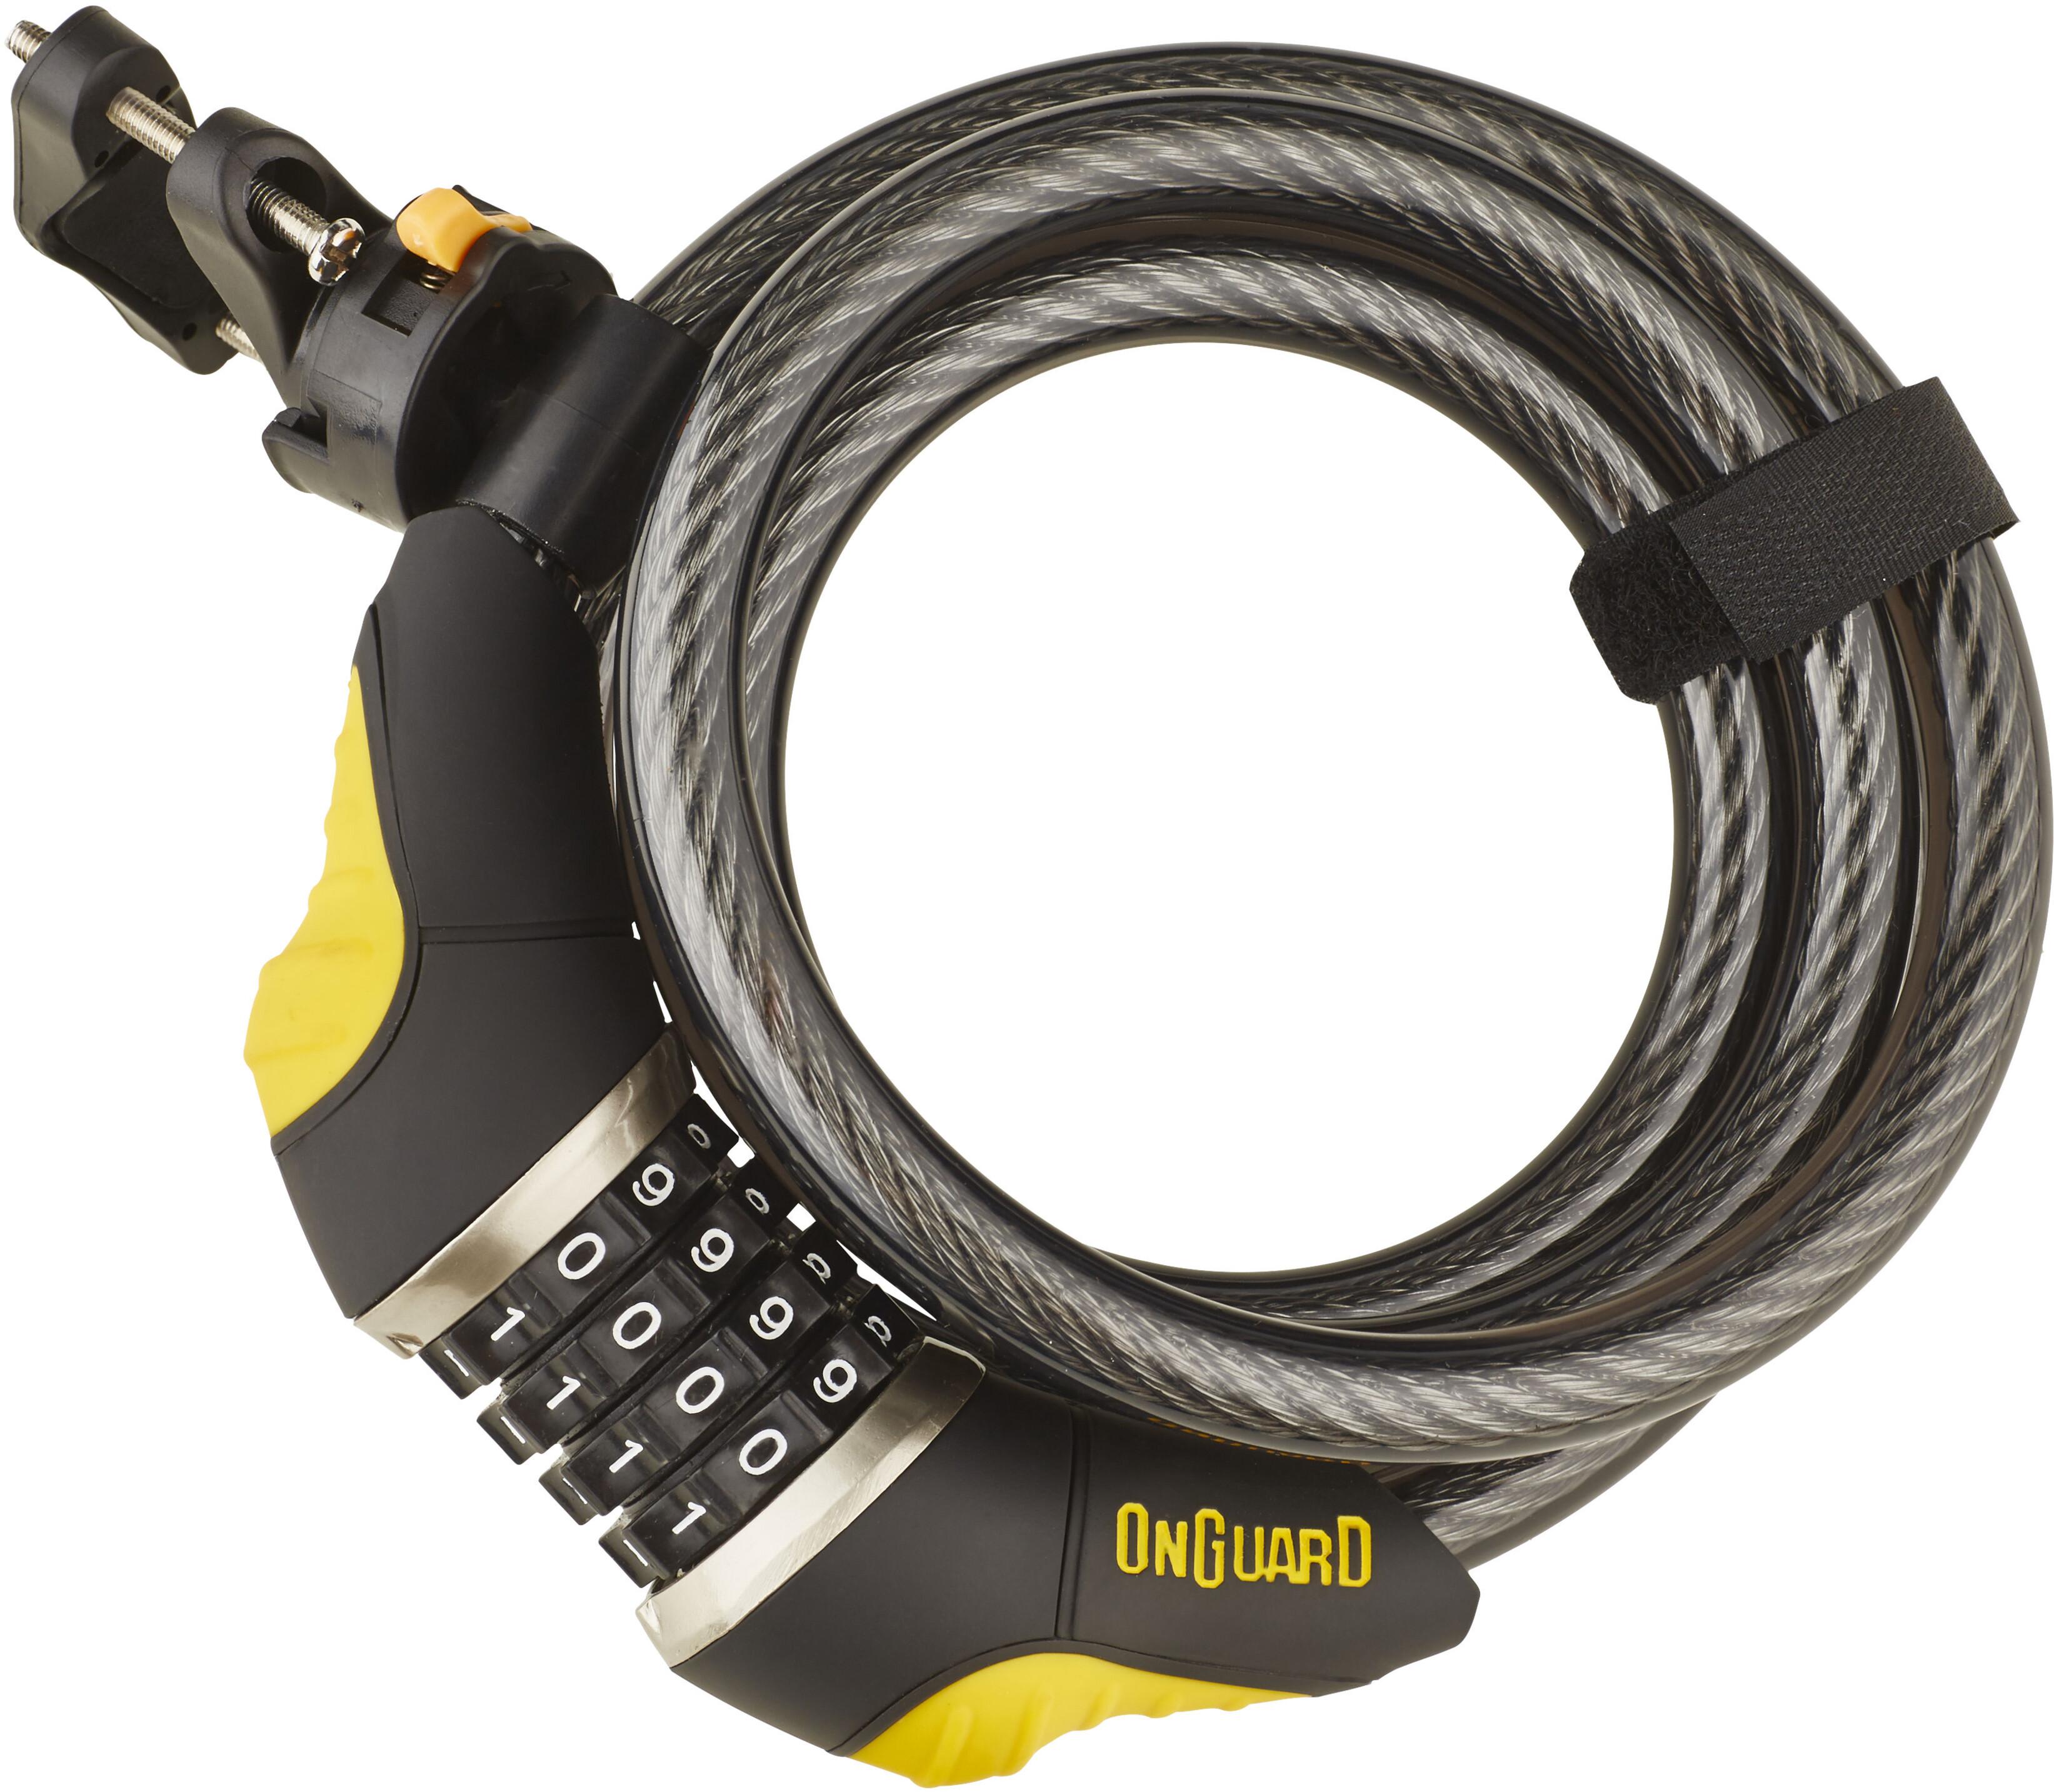 Onguard Dobermann Combo 8031 Spiral Cable Lock 185 Cm 216 12